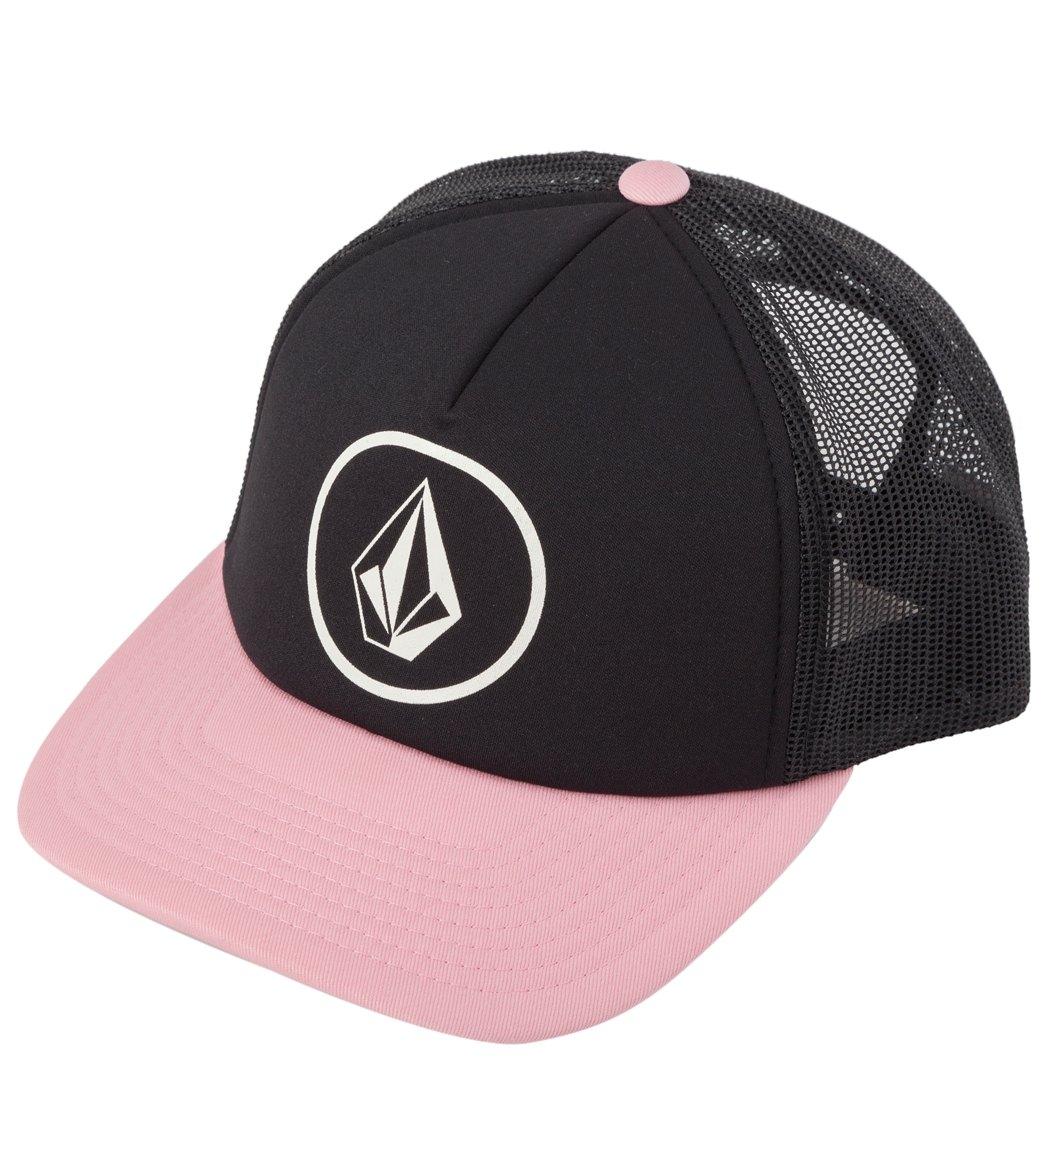 Volcom Nacho Trucker Hat at SwimOutlet.com 04da1b58fb2b